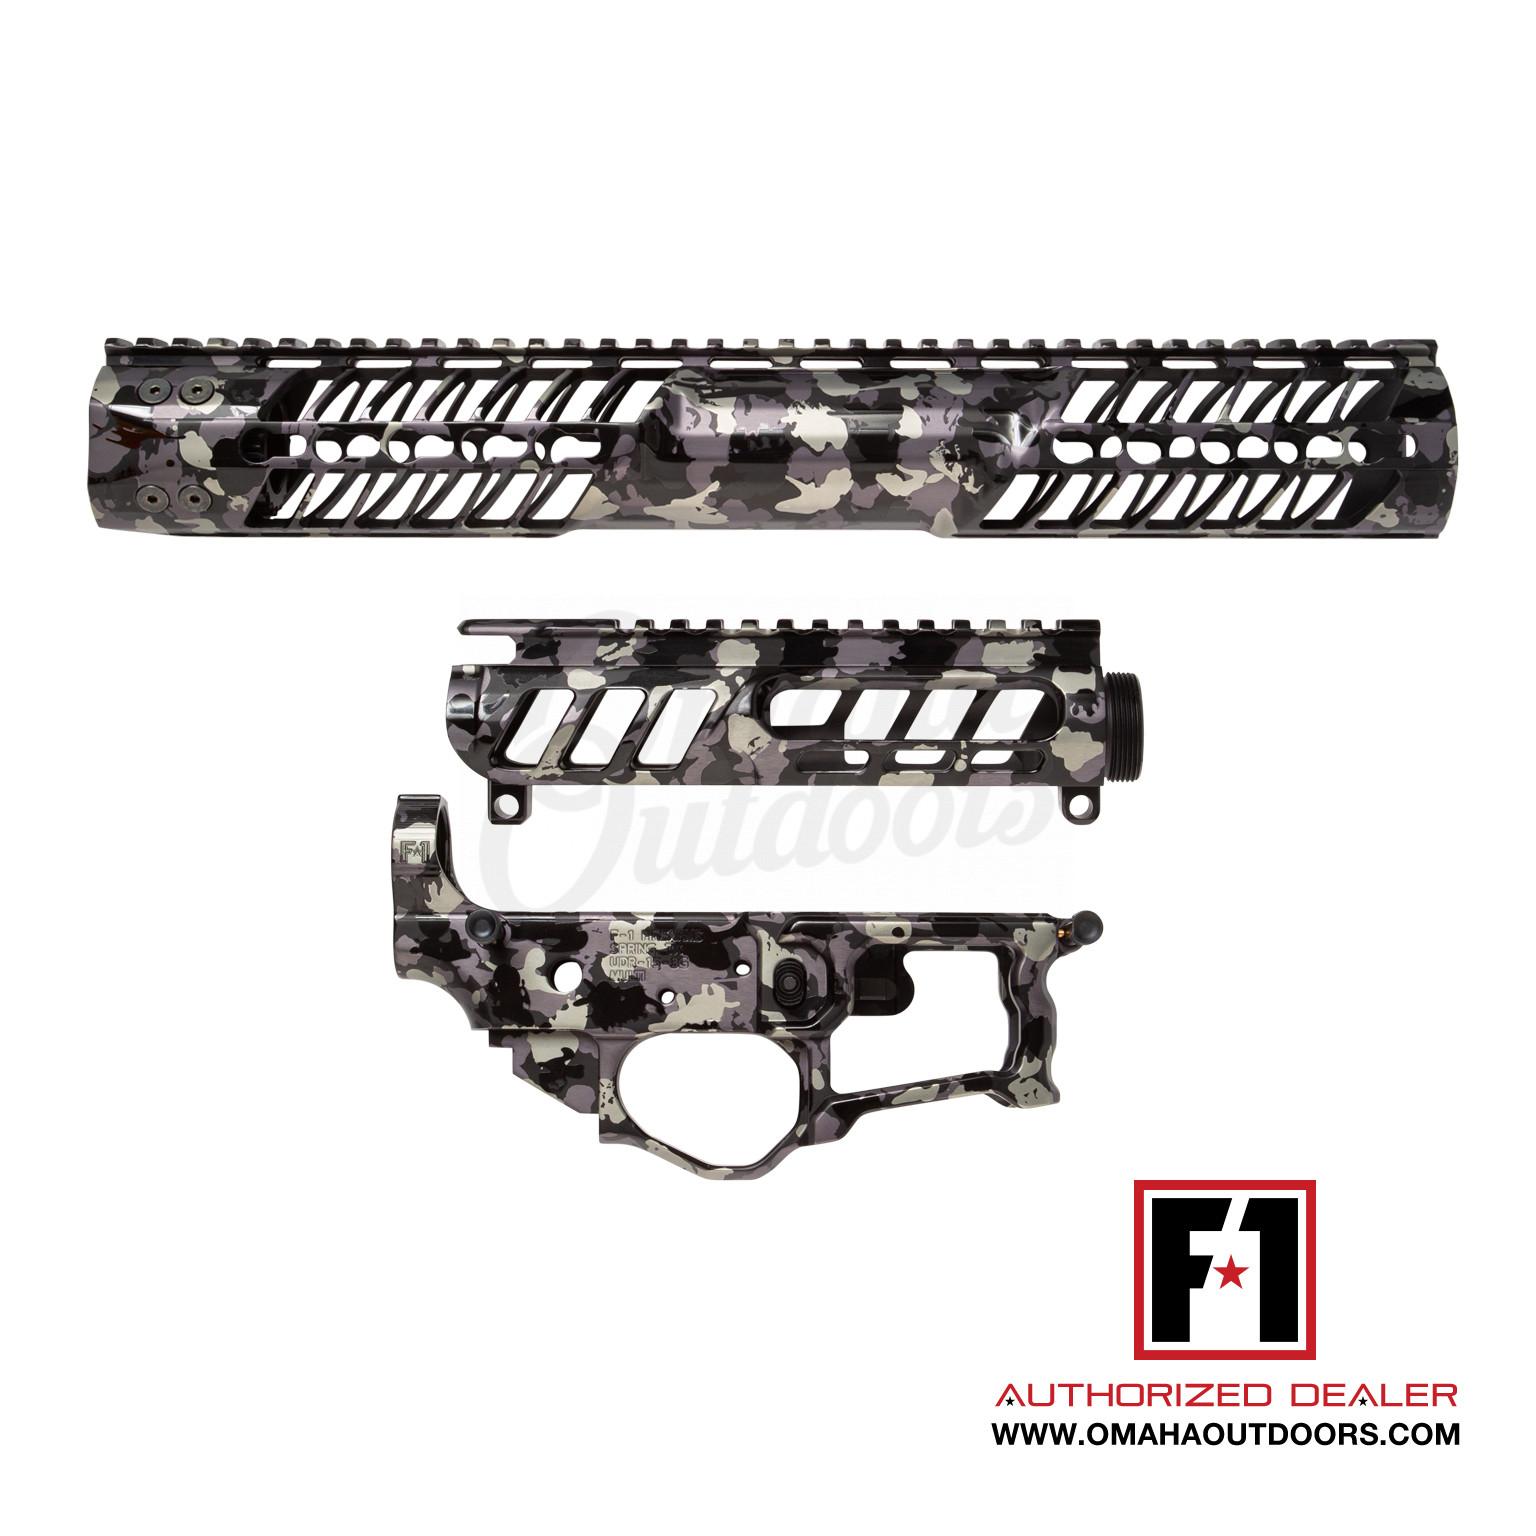 F1 Firearms Bdr 15 3g Chassis Carbon Camo Receiver Set Ar 15 14 75 C7k Keymod Handguard Upper Lower Bdr 15 3g C7k 14 Carbon Camo P M